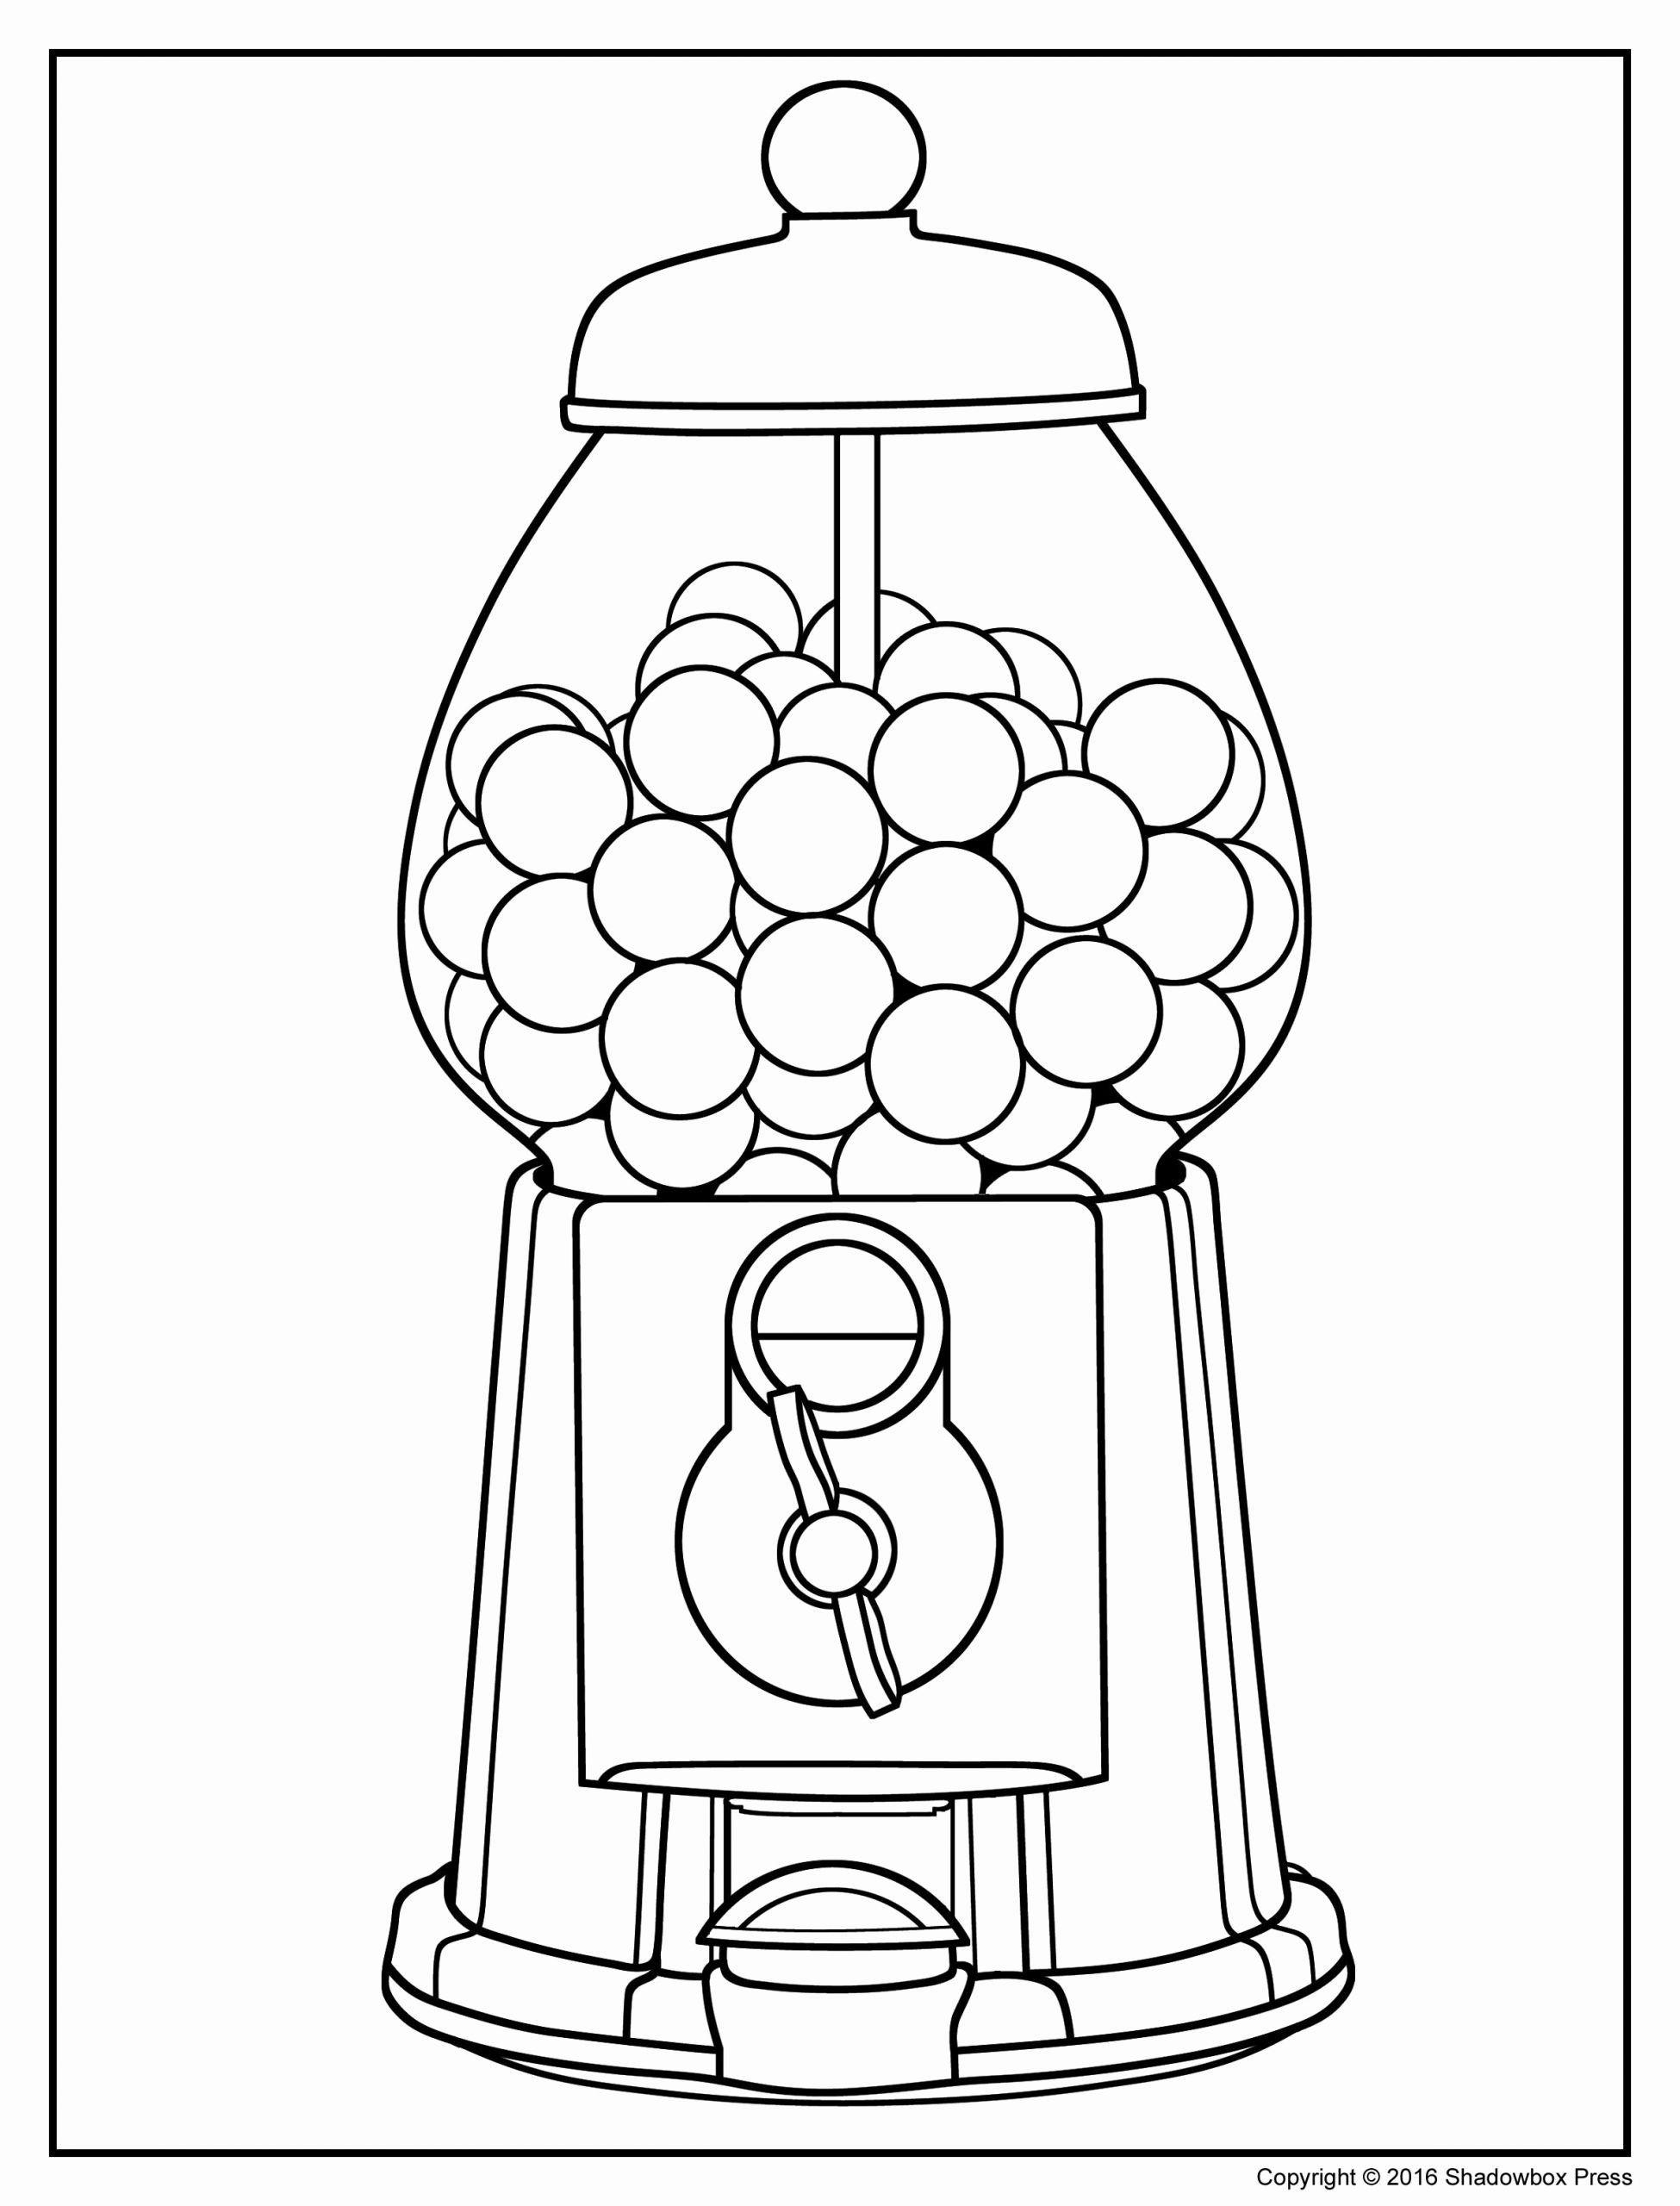 Google Image Result For Http 4 Bp Blogspot Com Qylz Dma4k0 Swp2 938lzi Aaaaaaaaga8 Hxo4zb7vxtk S1600 Bubble Gum Machine Gumball Machine Heart Coloring Pages